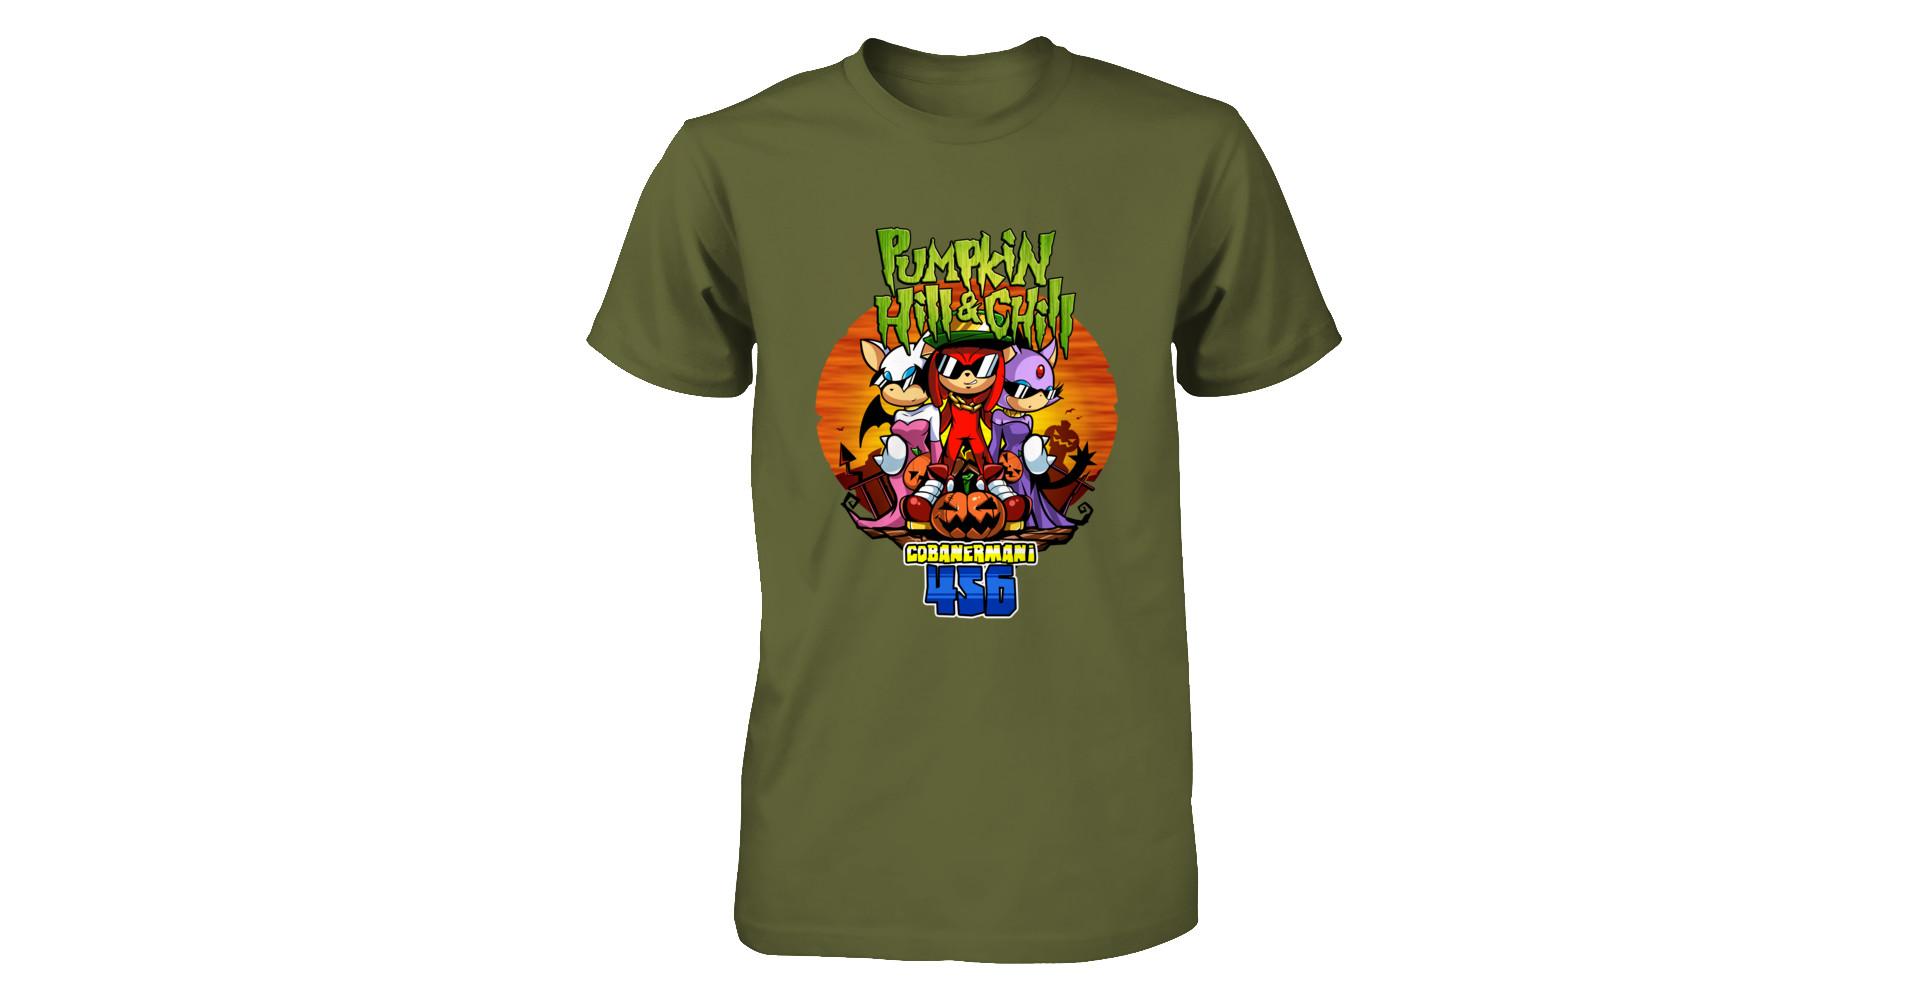 288a9555 Pumpkin Hill & Chill - T-shirts!   Represent